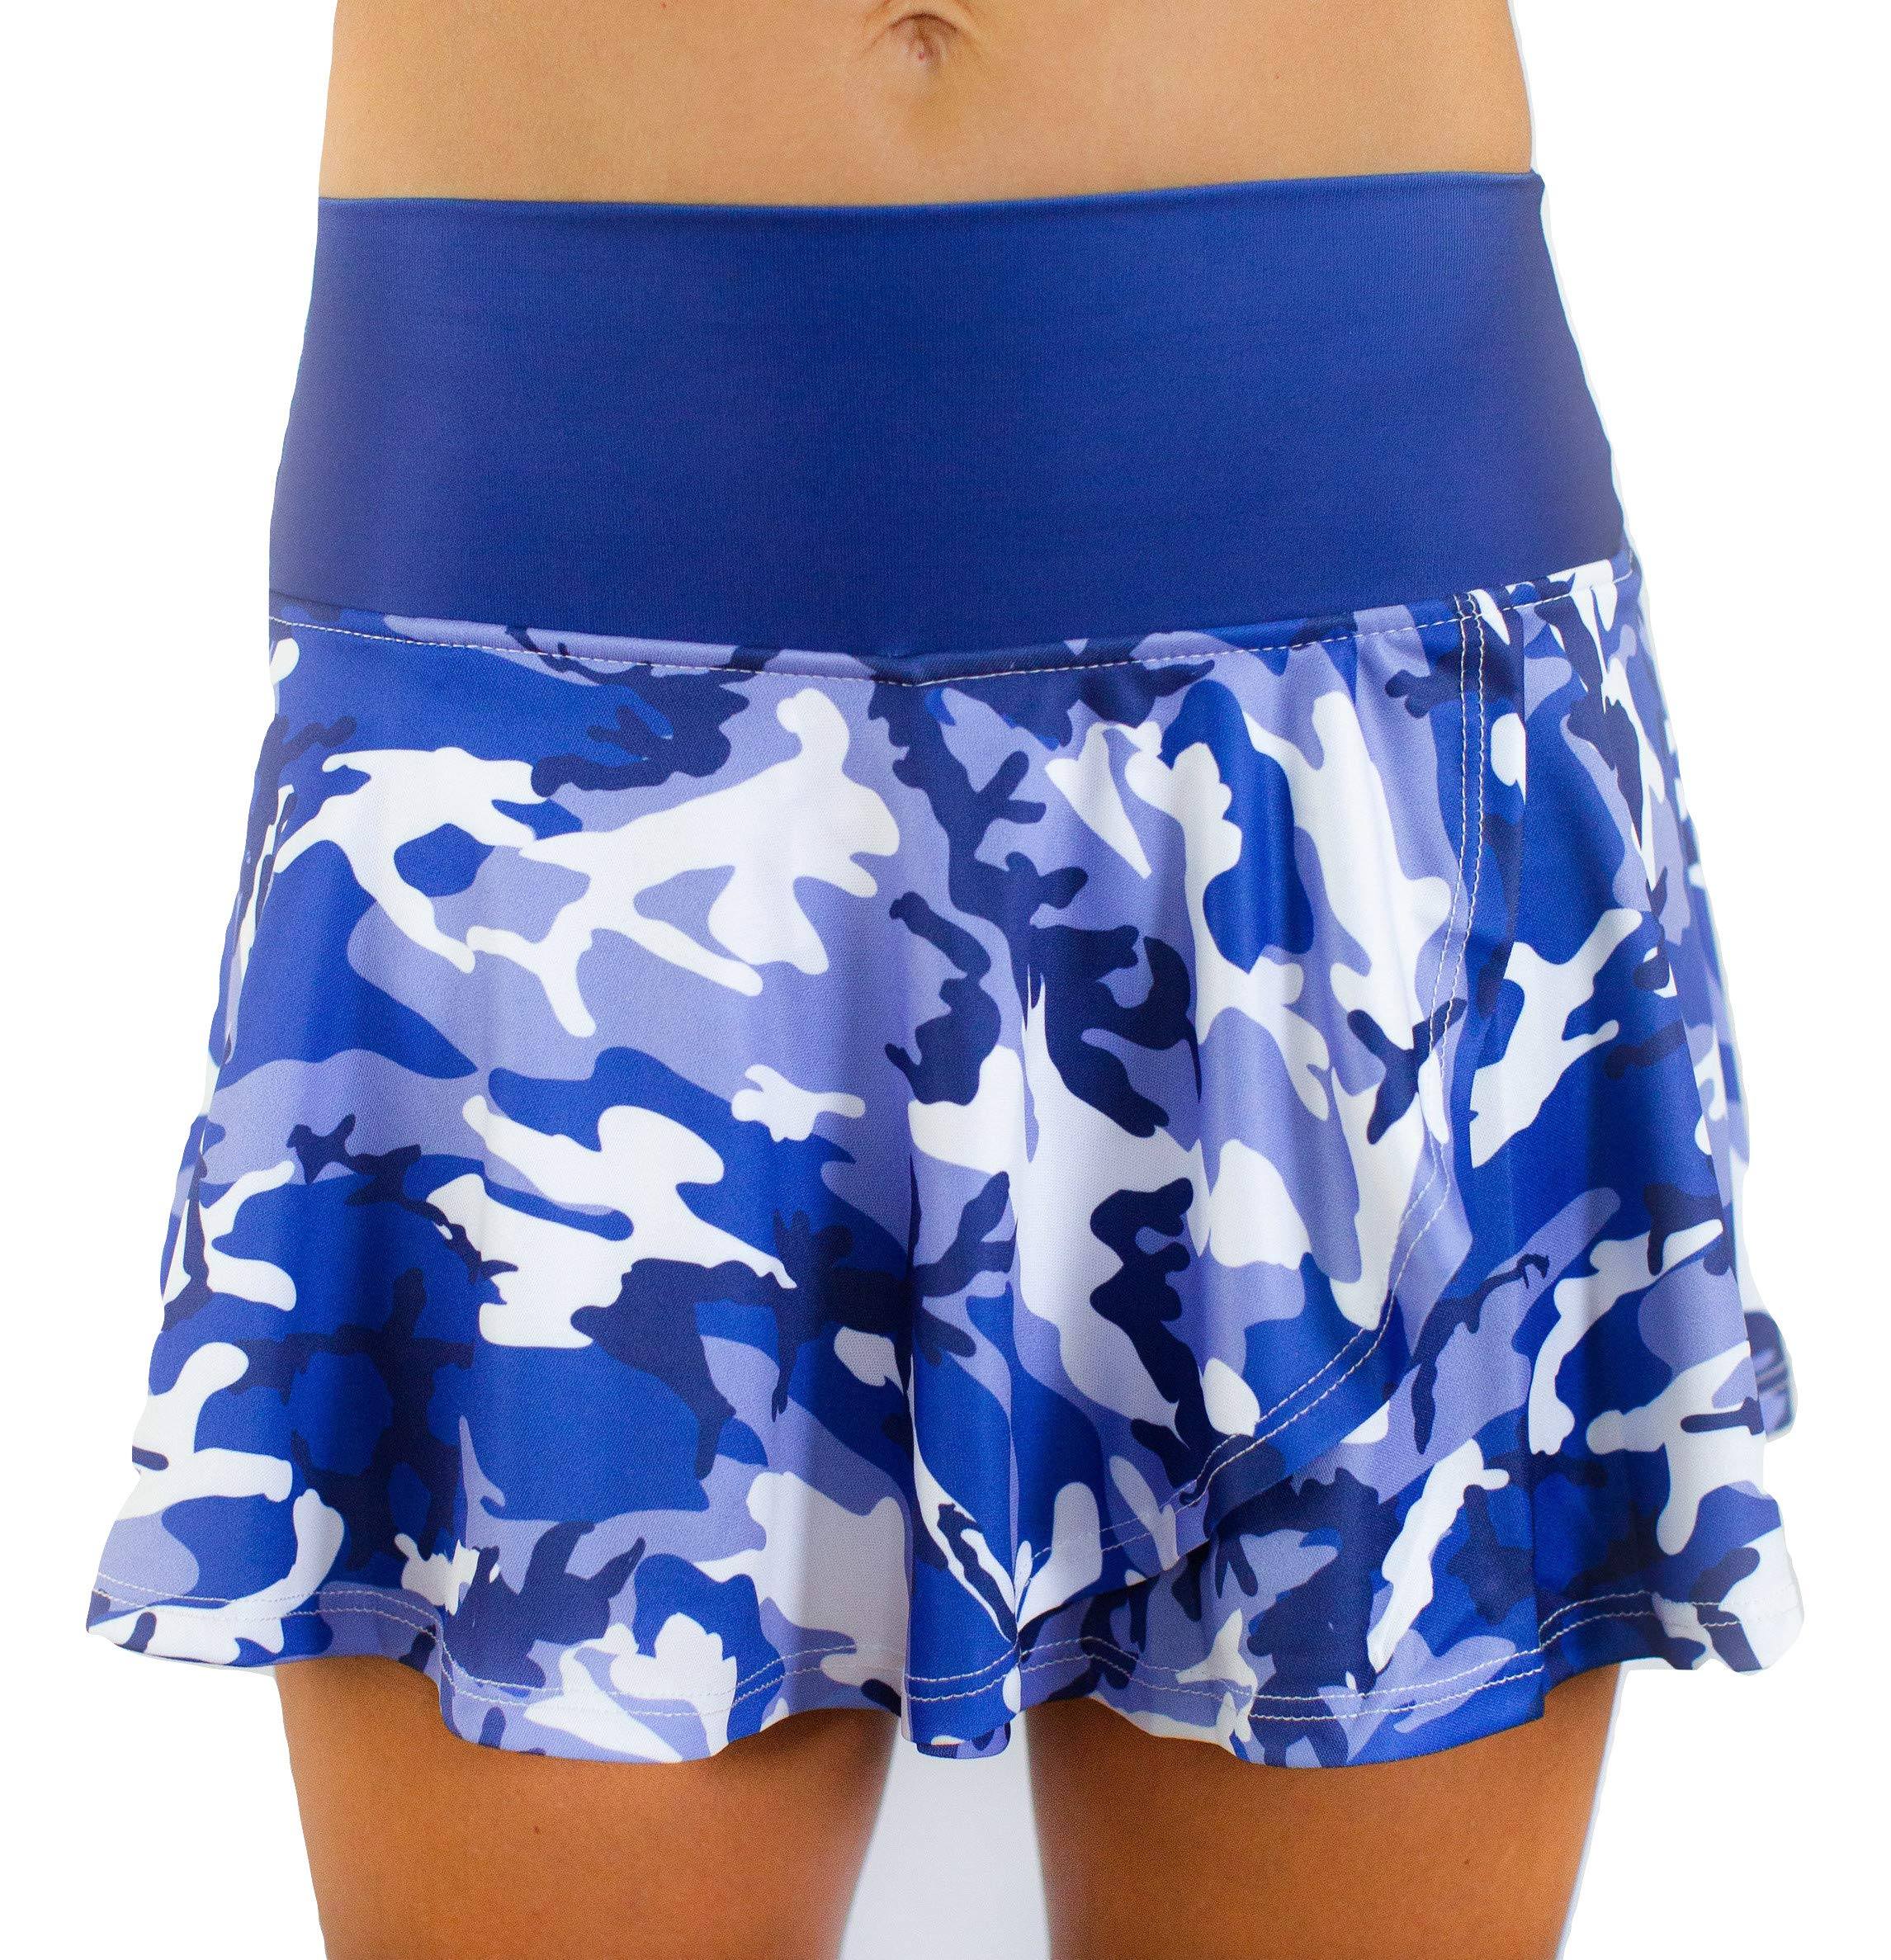 Faye+Florie Holly Tennis Skirt (Blue Camo, X-Small)